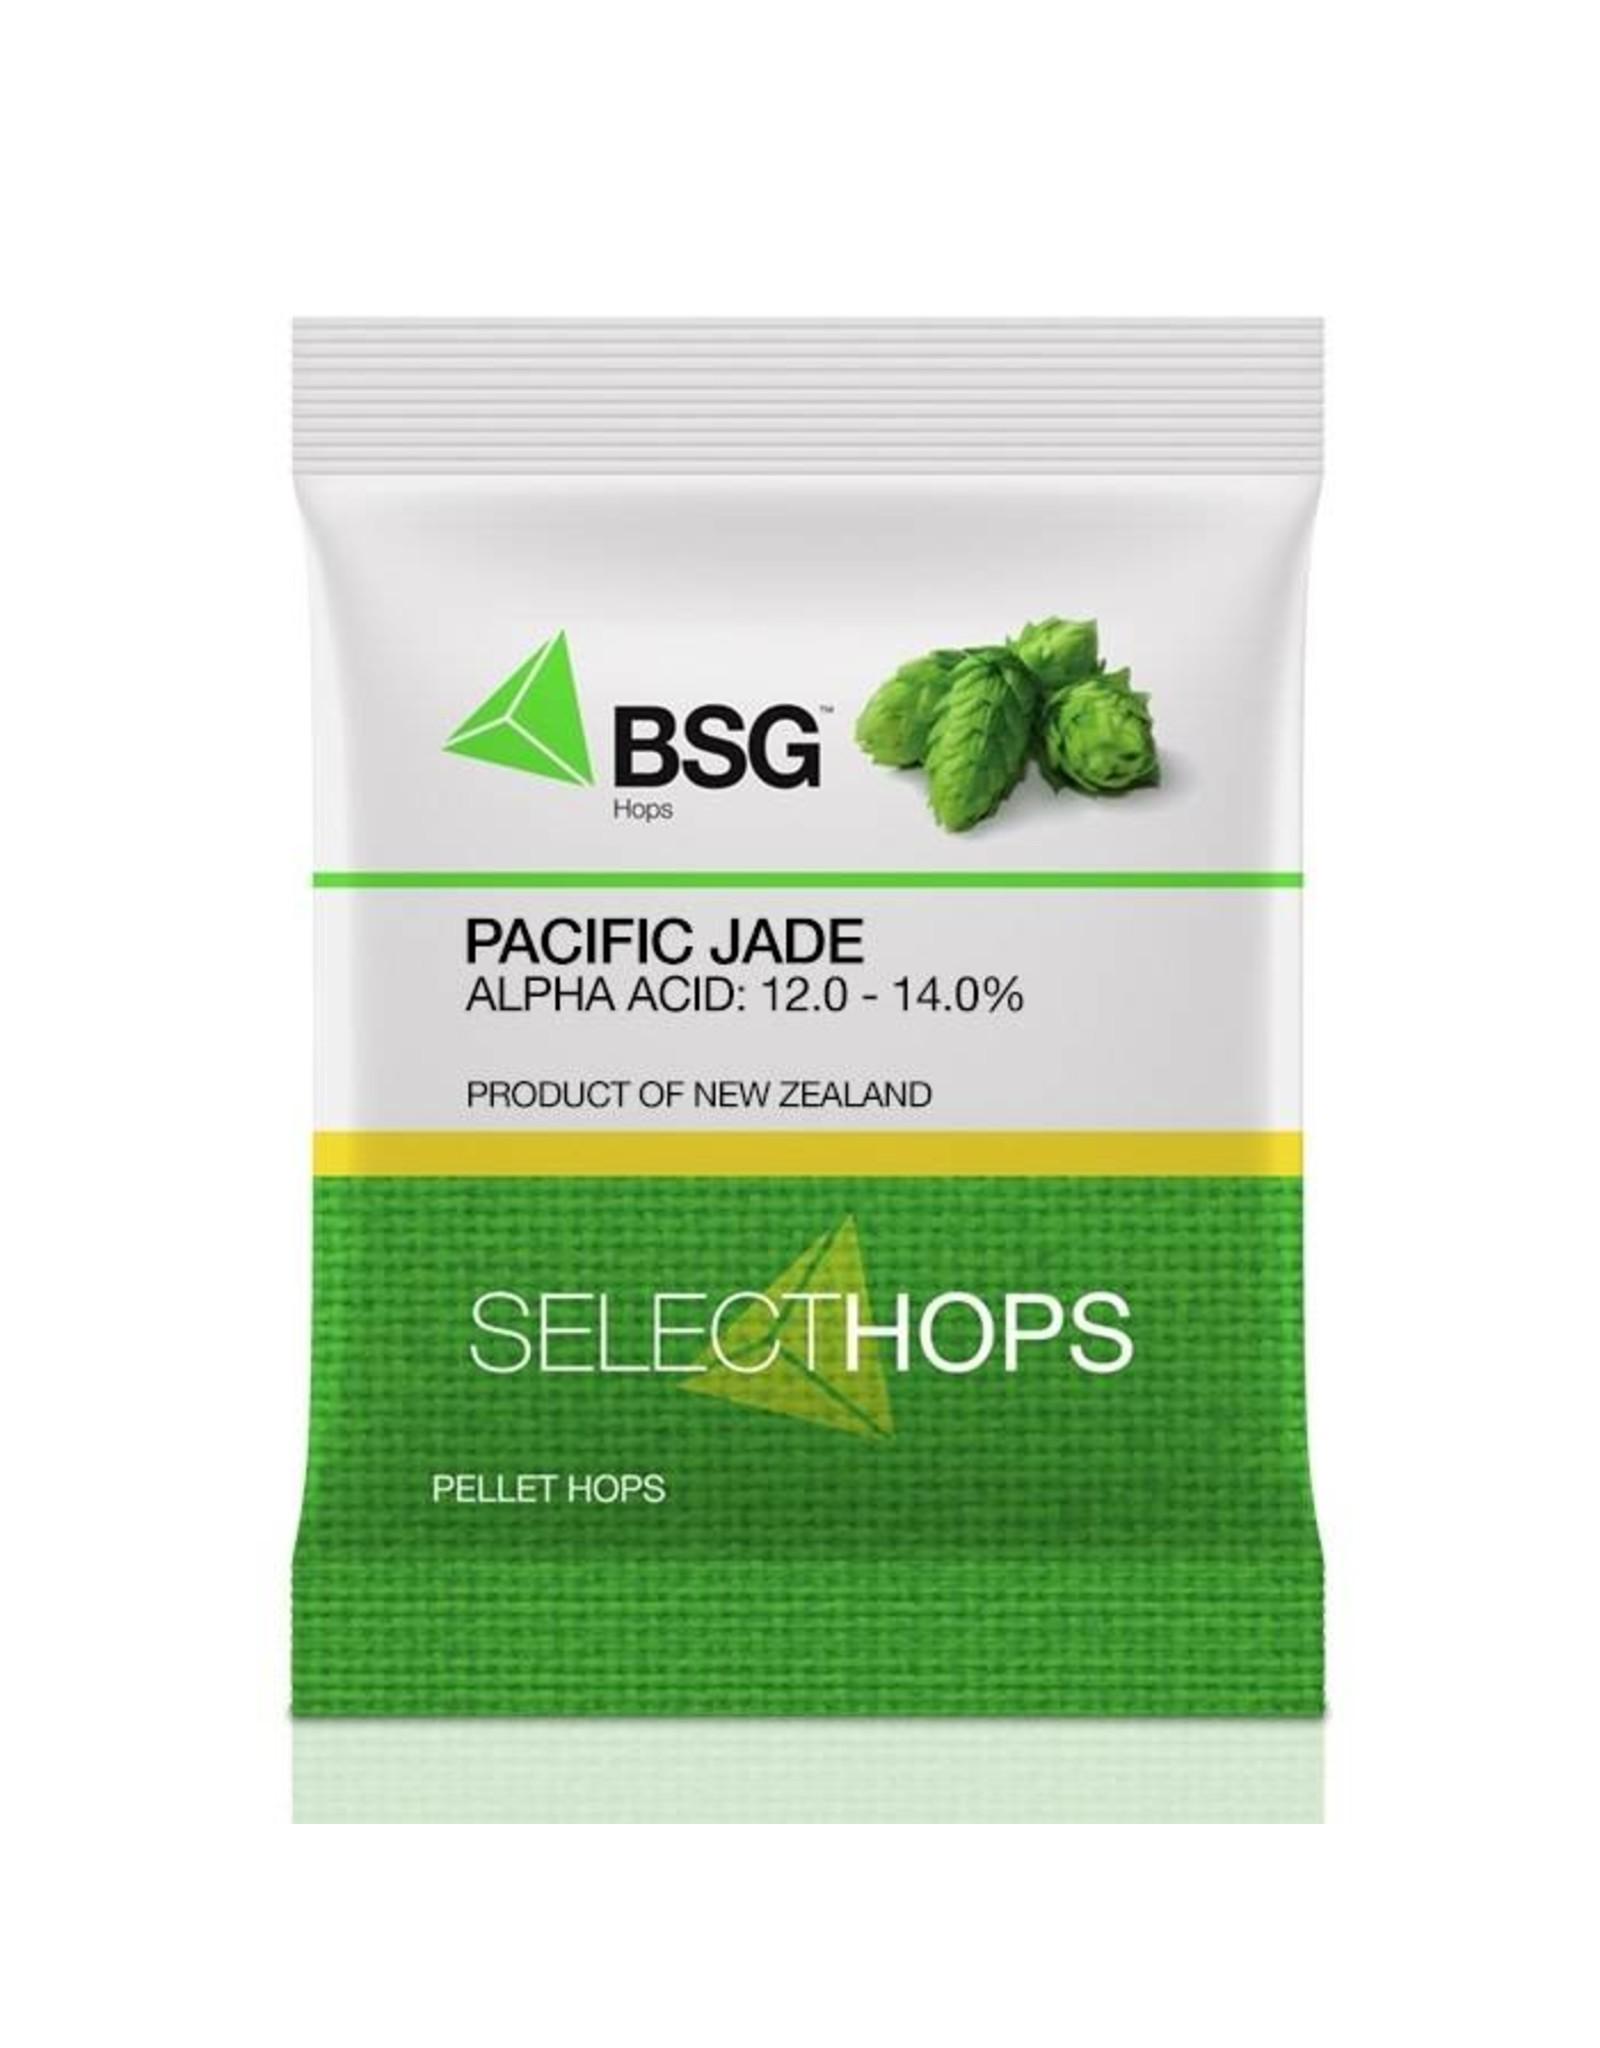 Pacific Jade (NZ) Pellet Hops 1oz